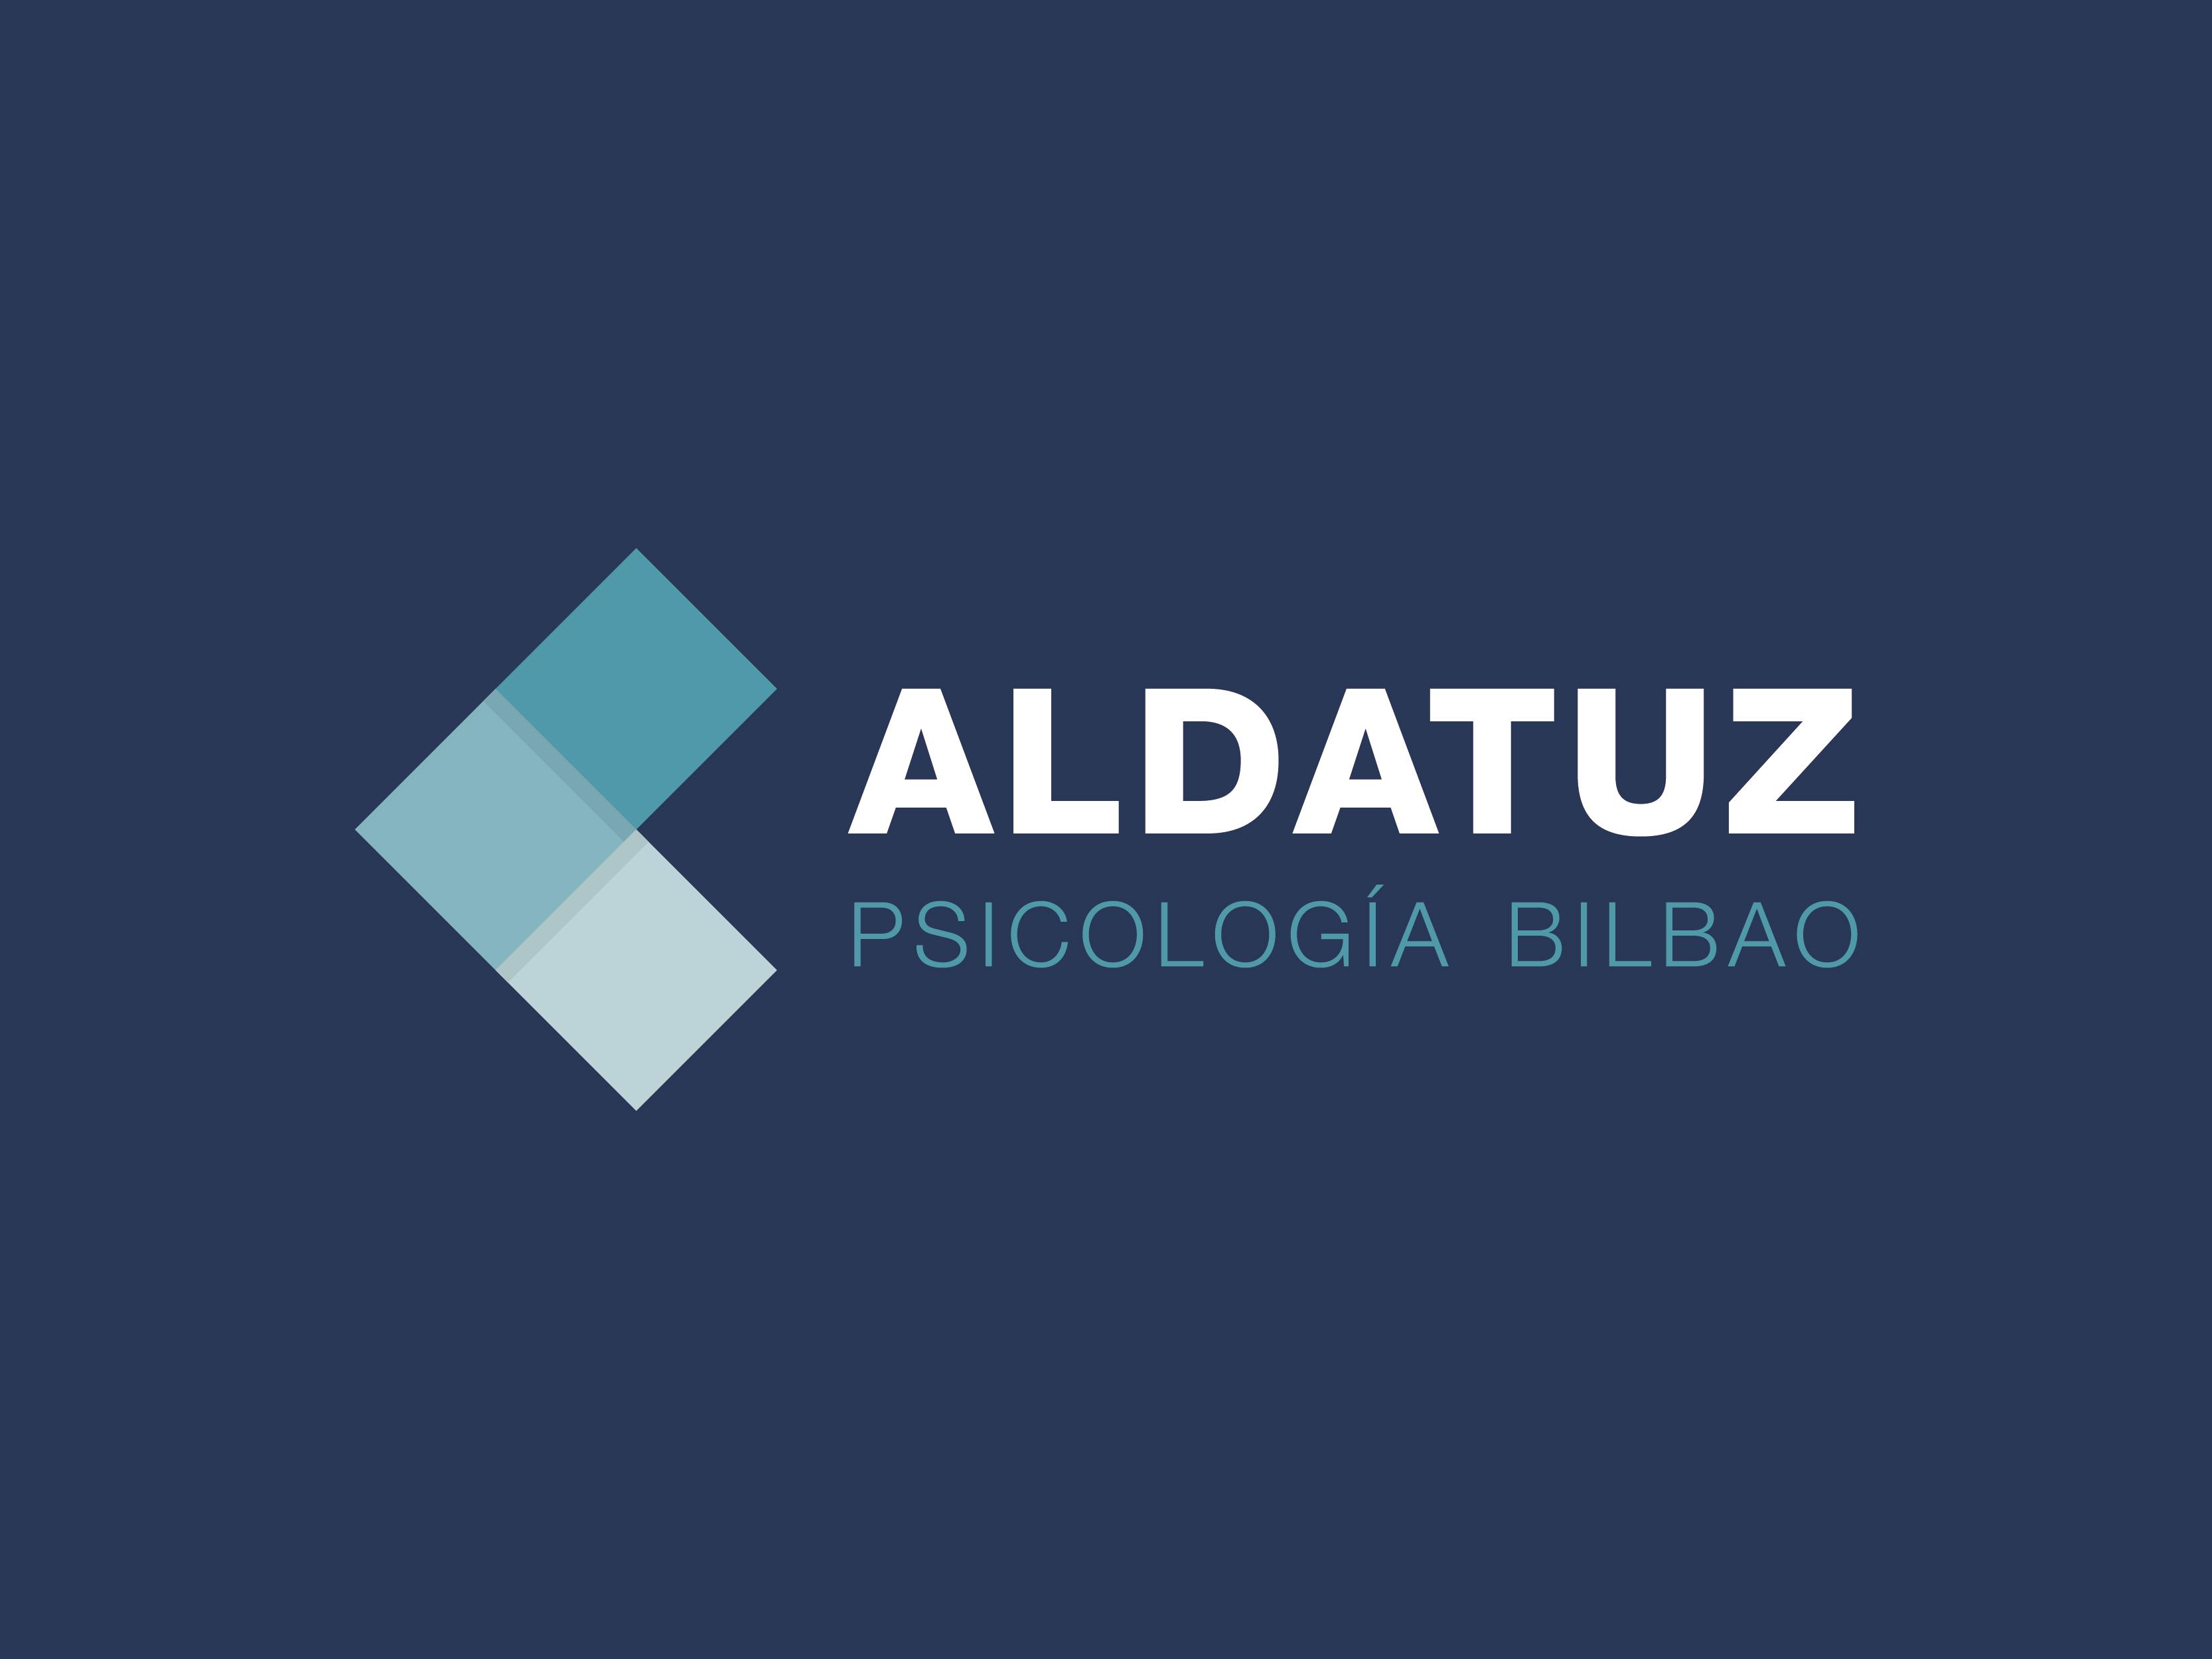 ALDATUZ_300ppp-02